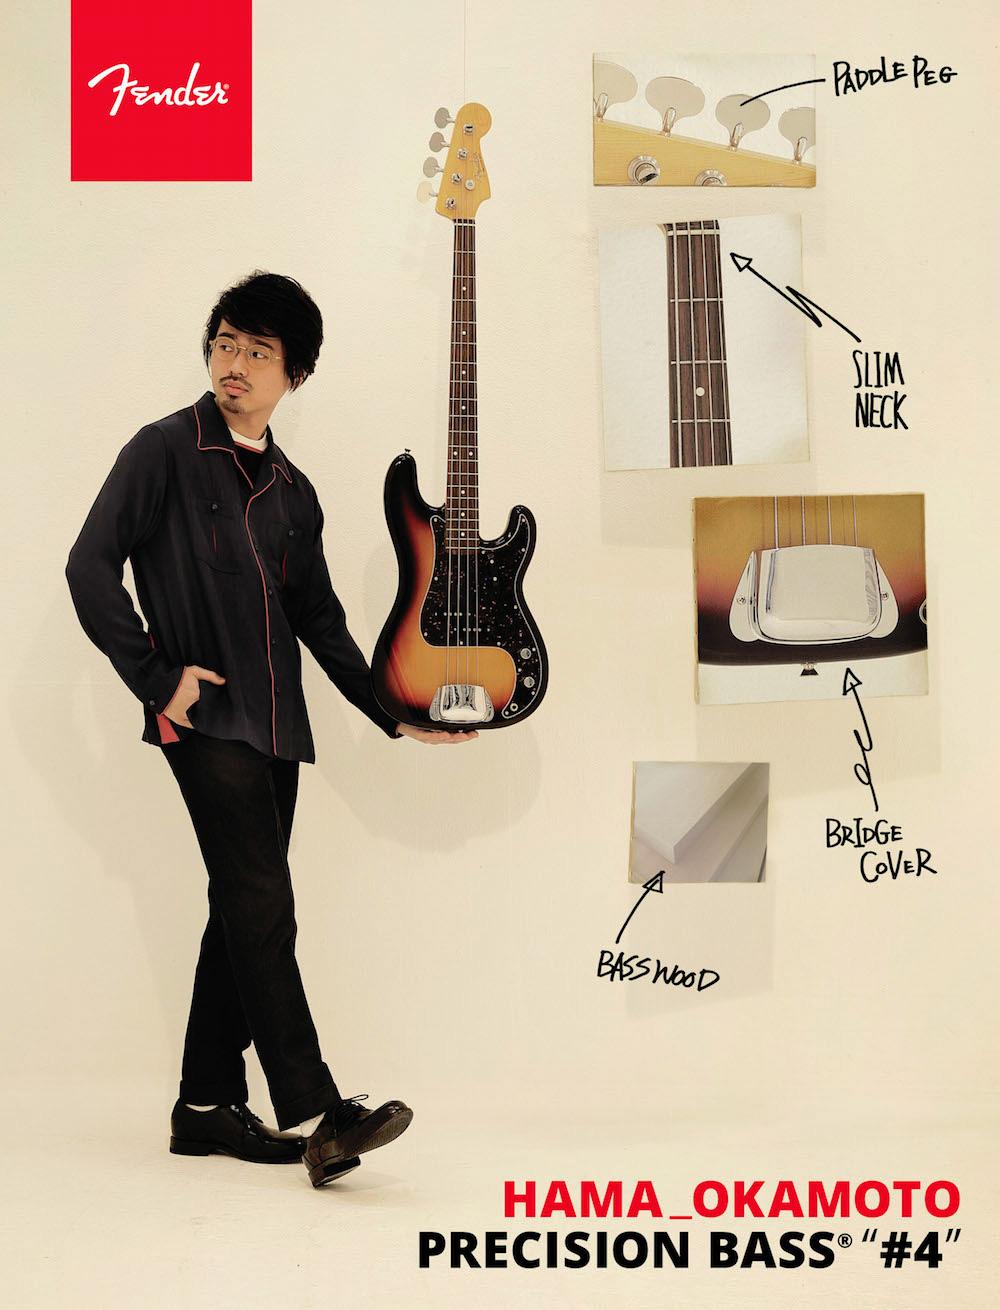 Hama Okamoto Precision Bass 発売決定告知チラシ